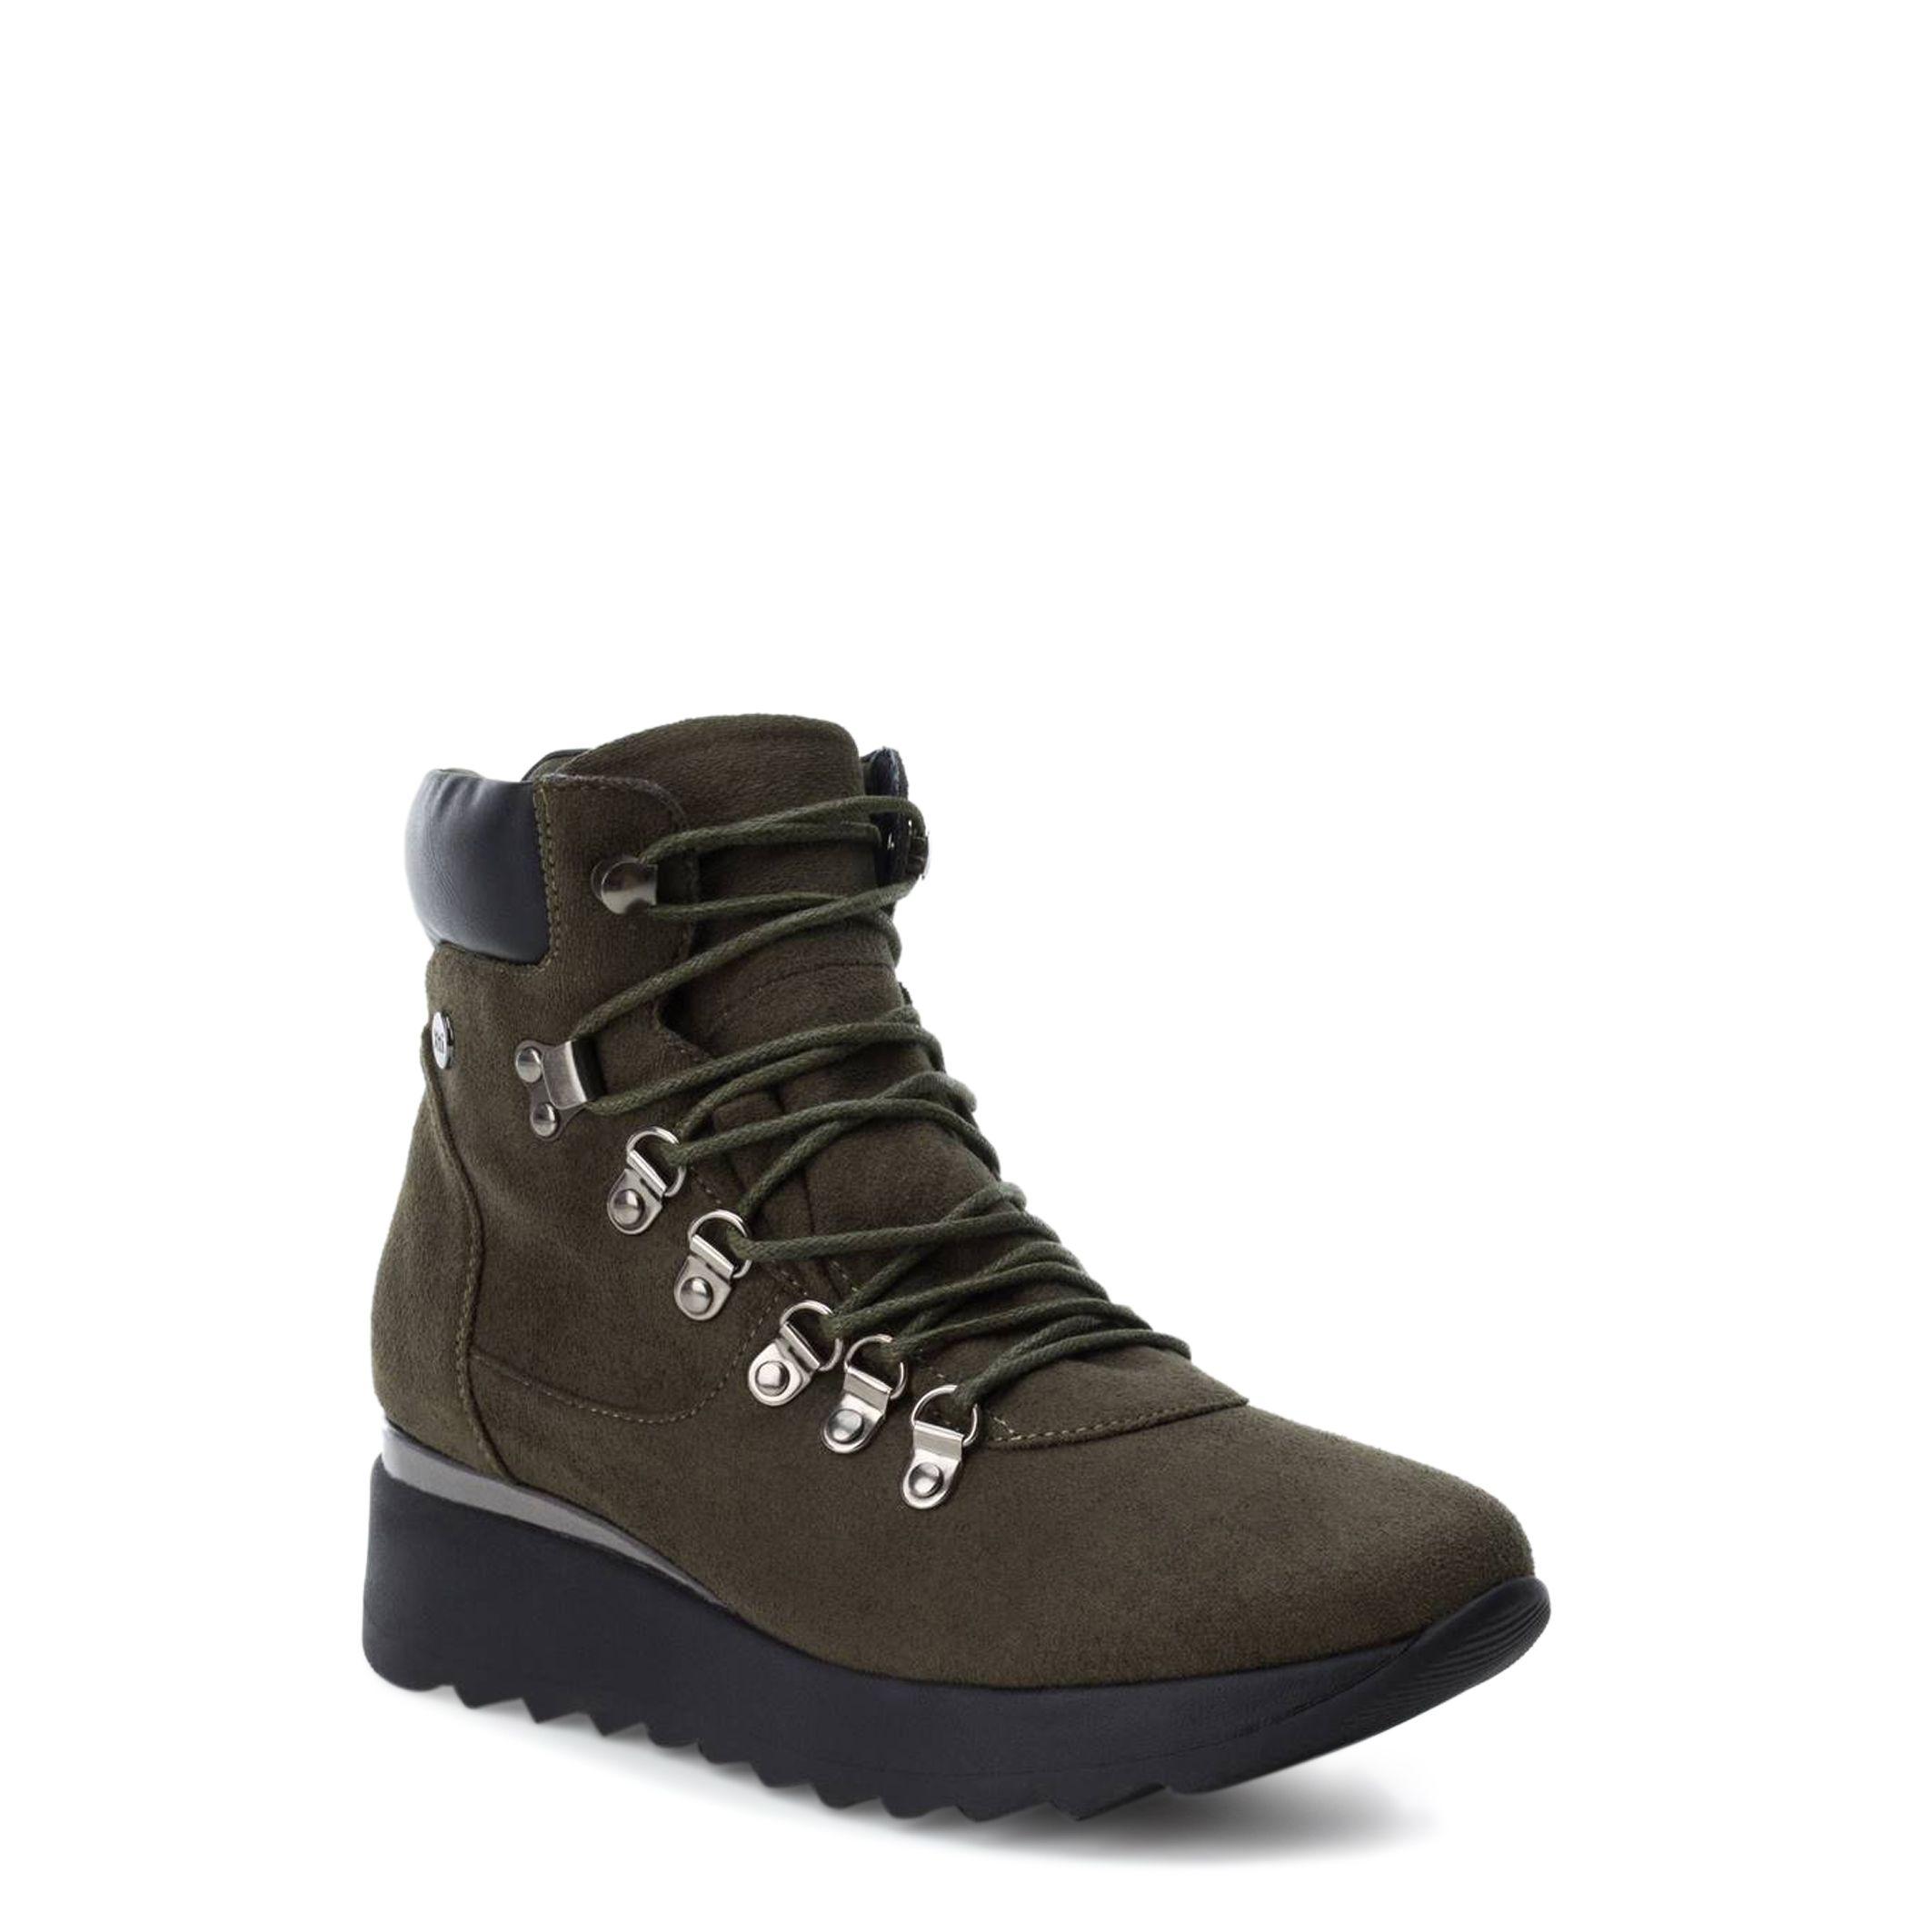 Schuhe Xti – 48487 – Grün